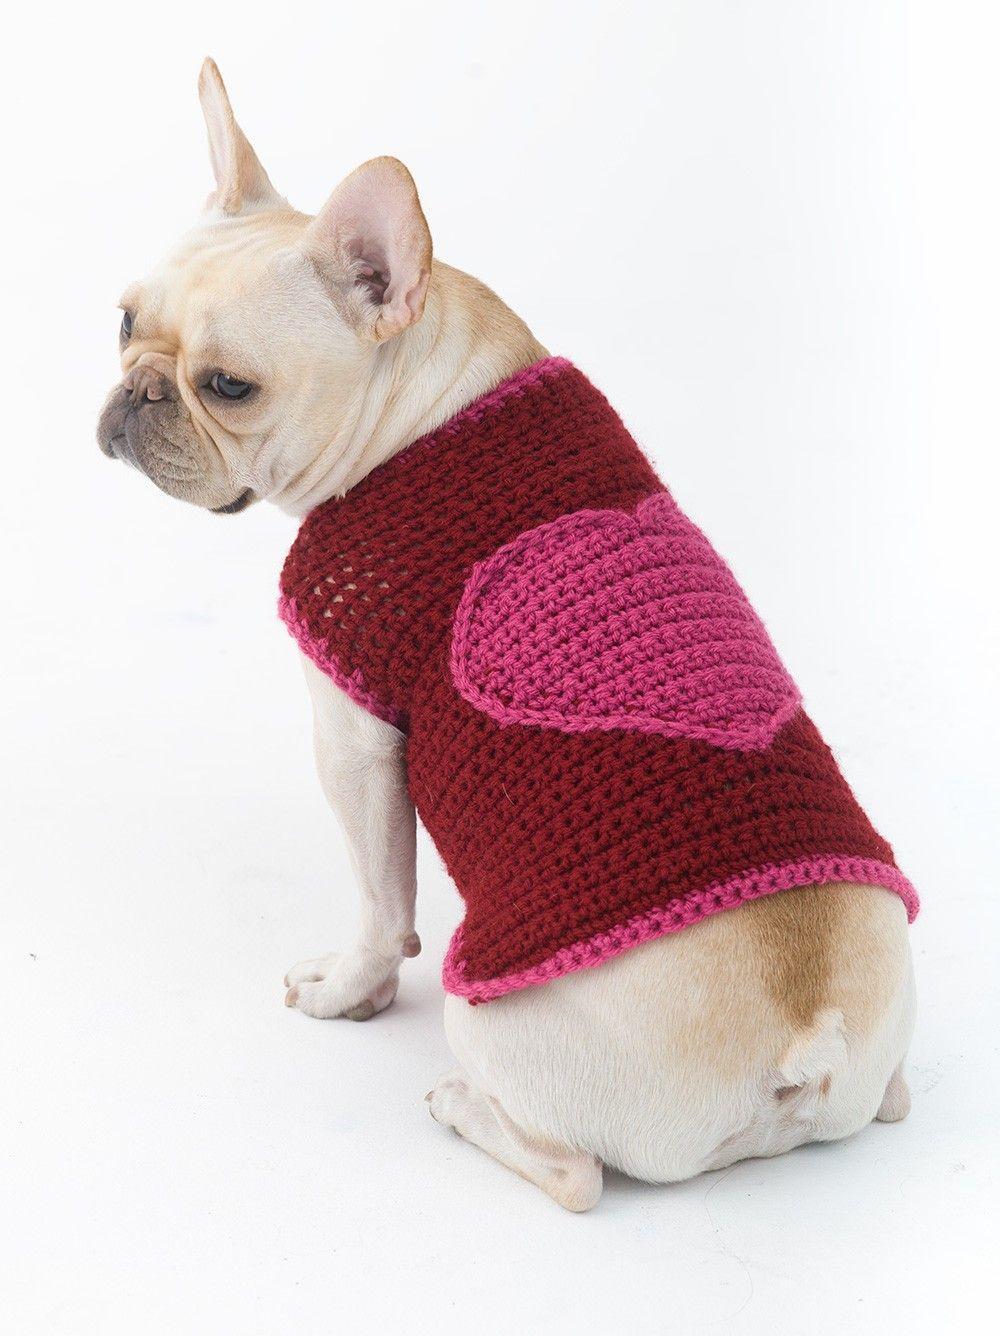 The Romantic Dog Sweater Pattern (Crochet) - Lion Brand Yarn ...